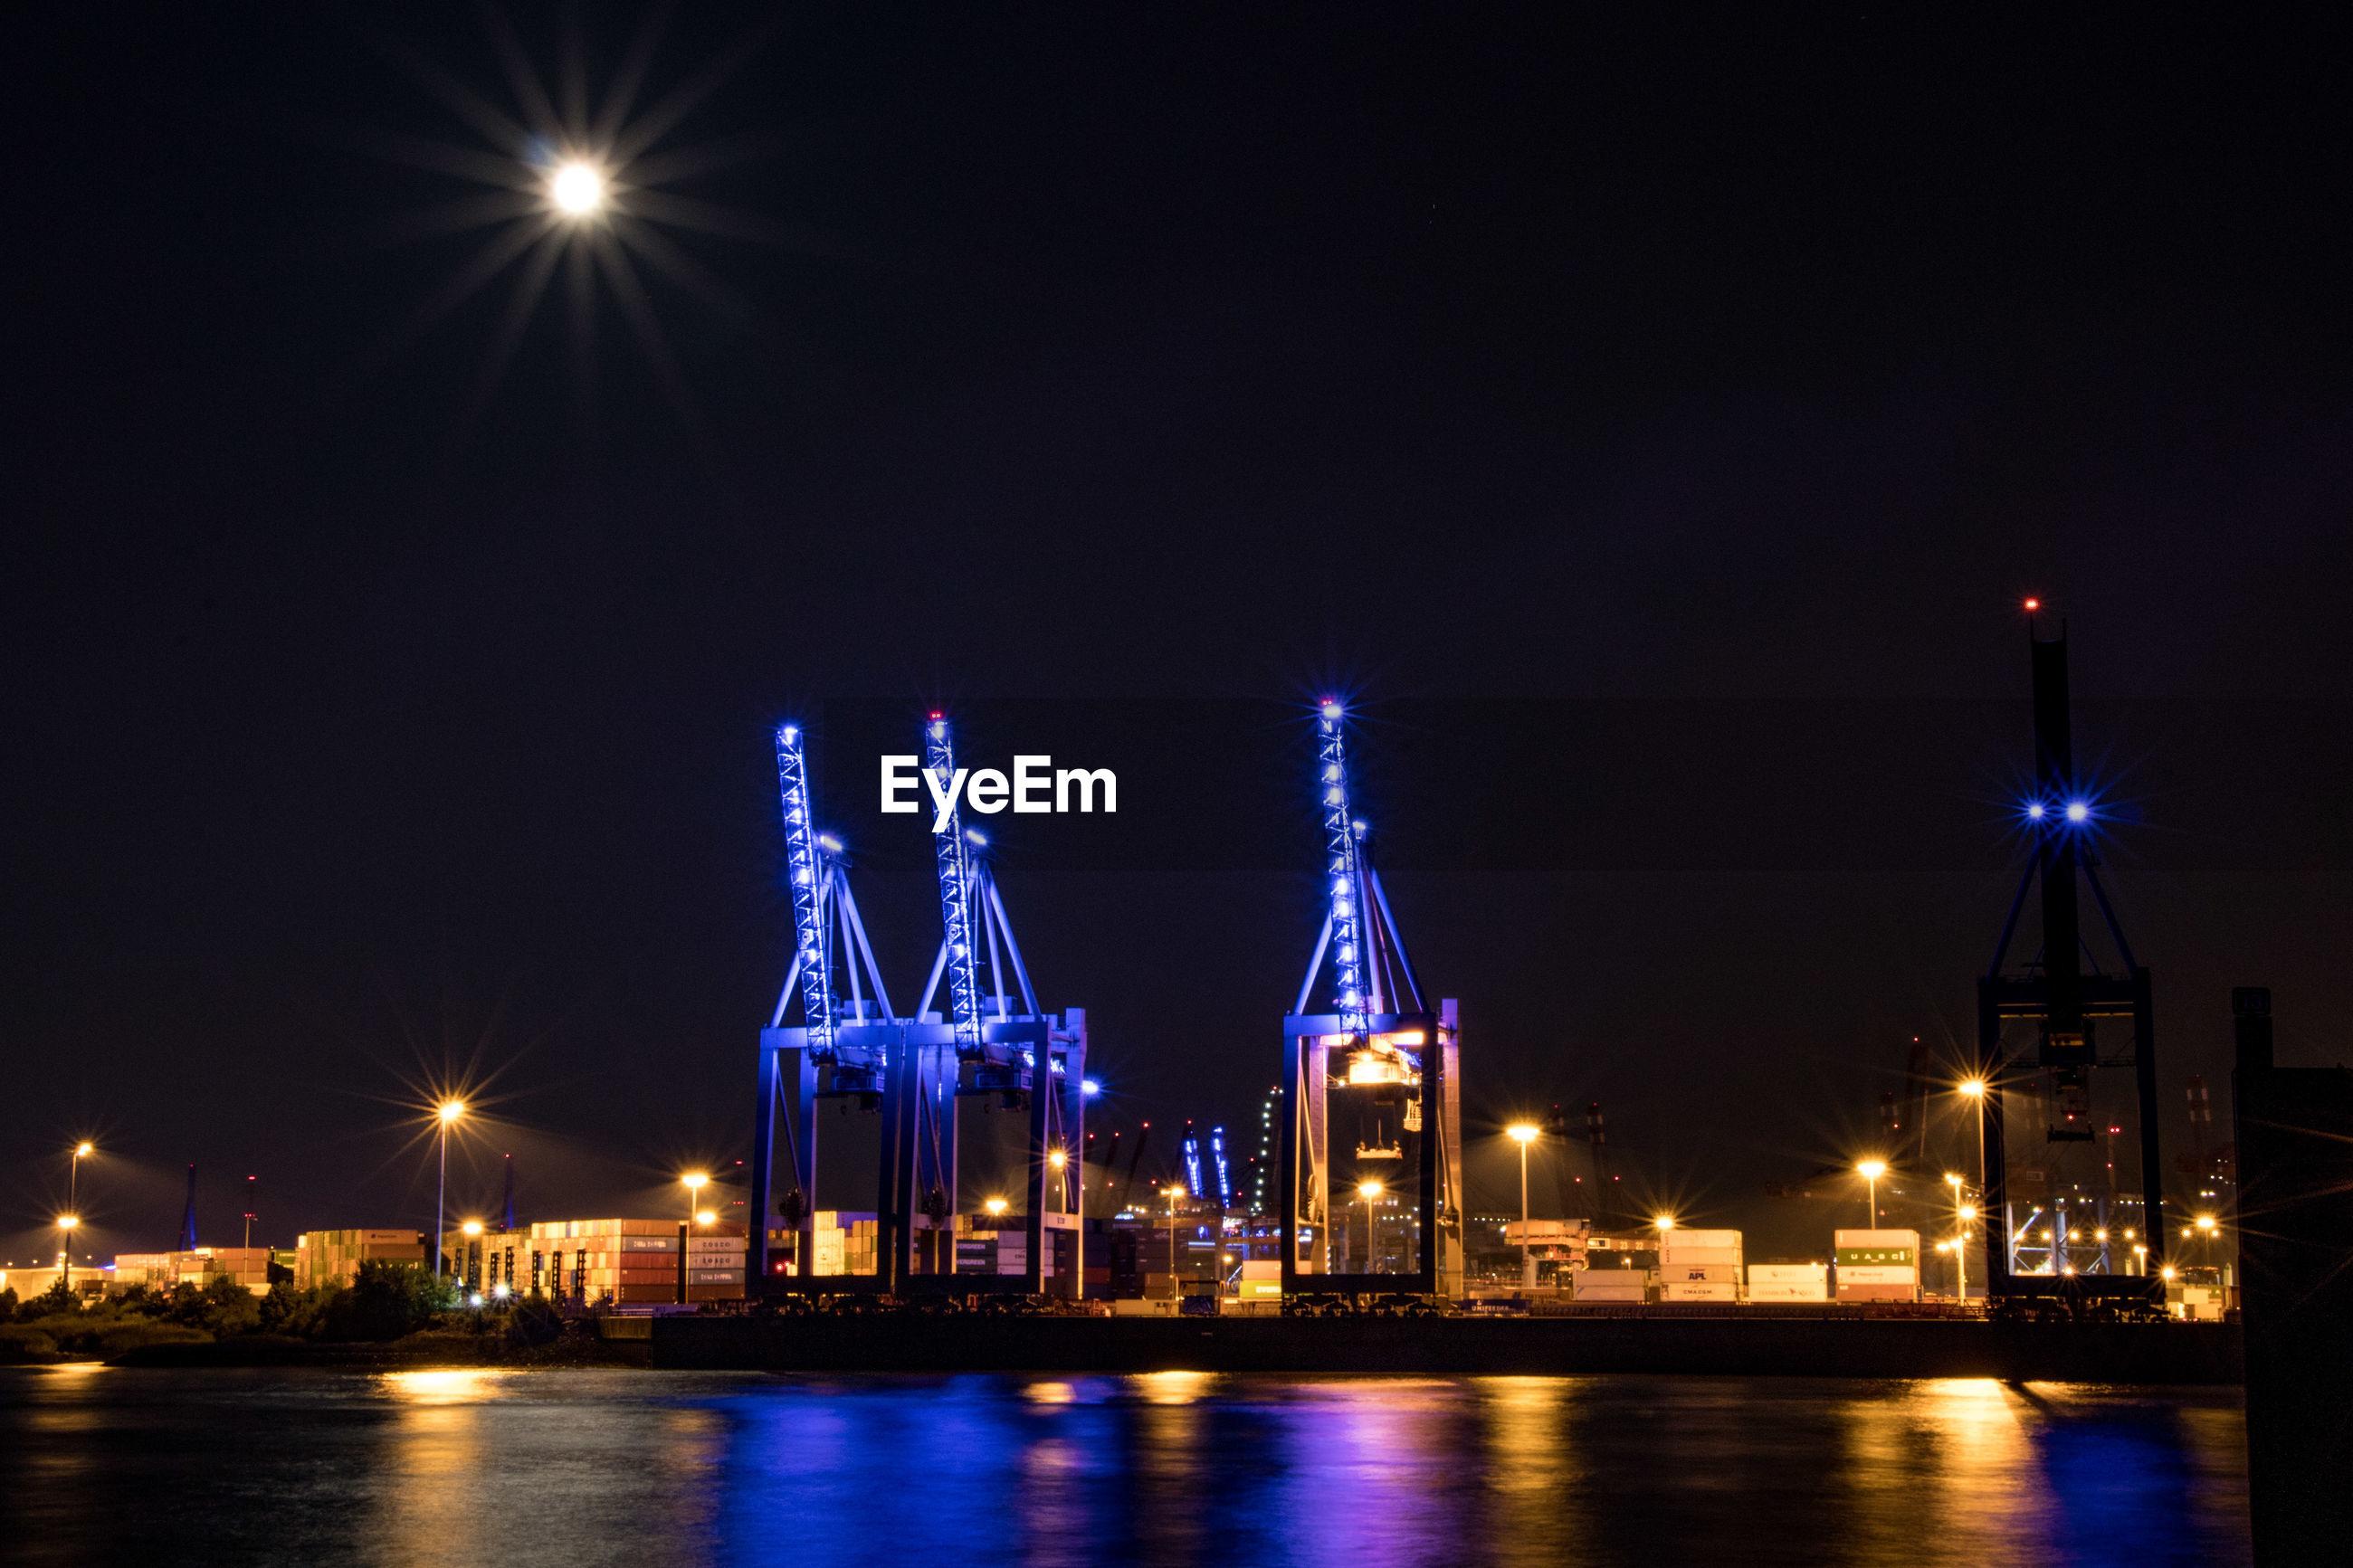 ILLUMINATED CITY SKYLINE AGAINST SKY AT NIGHT